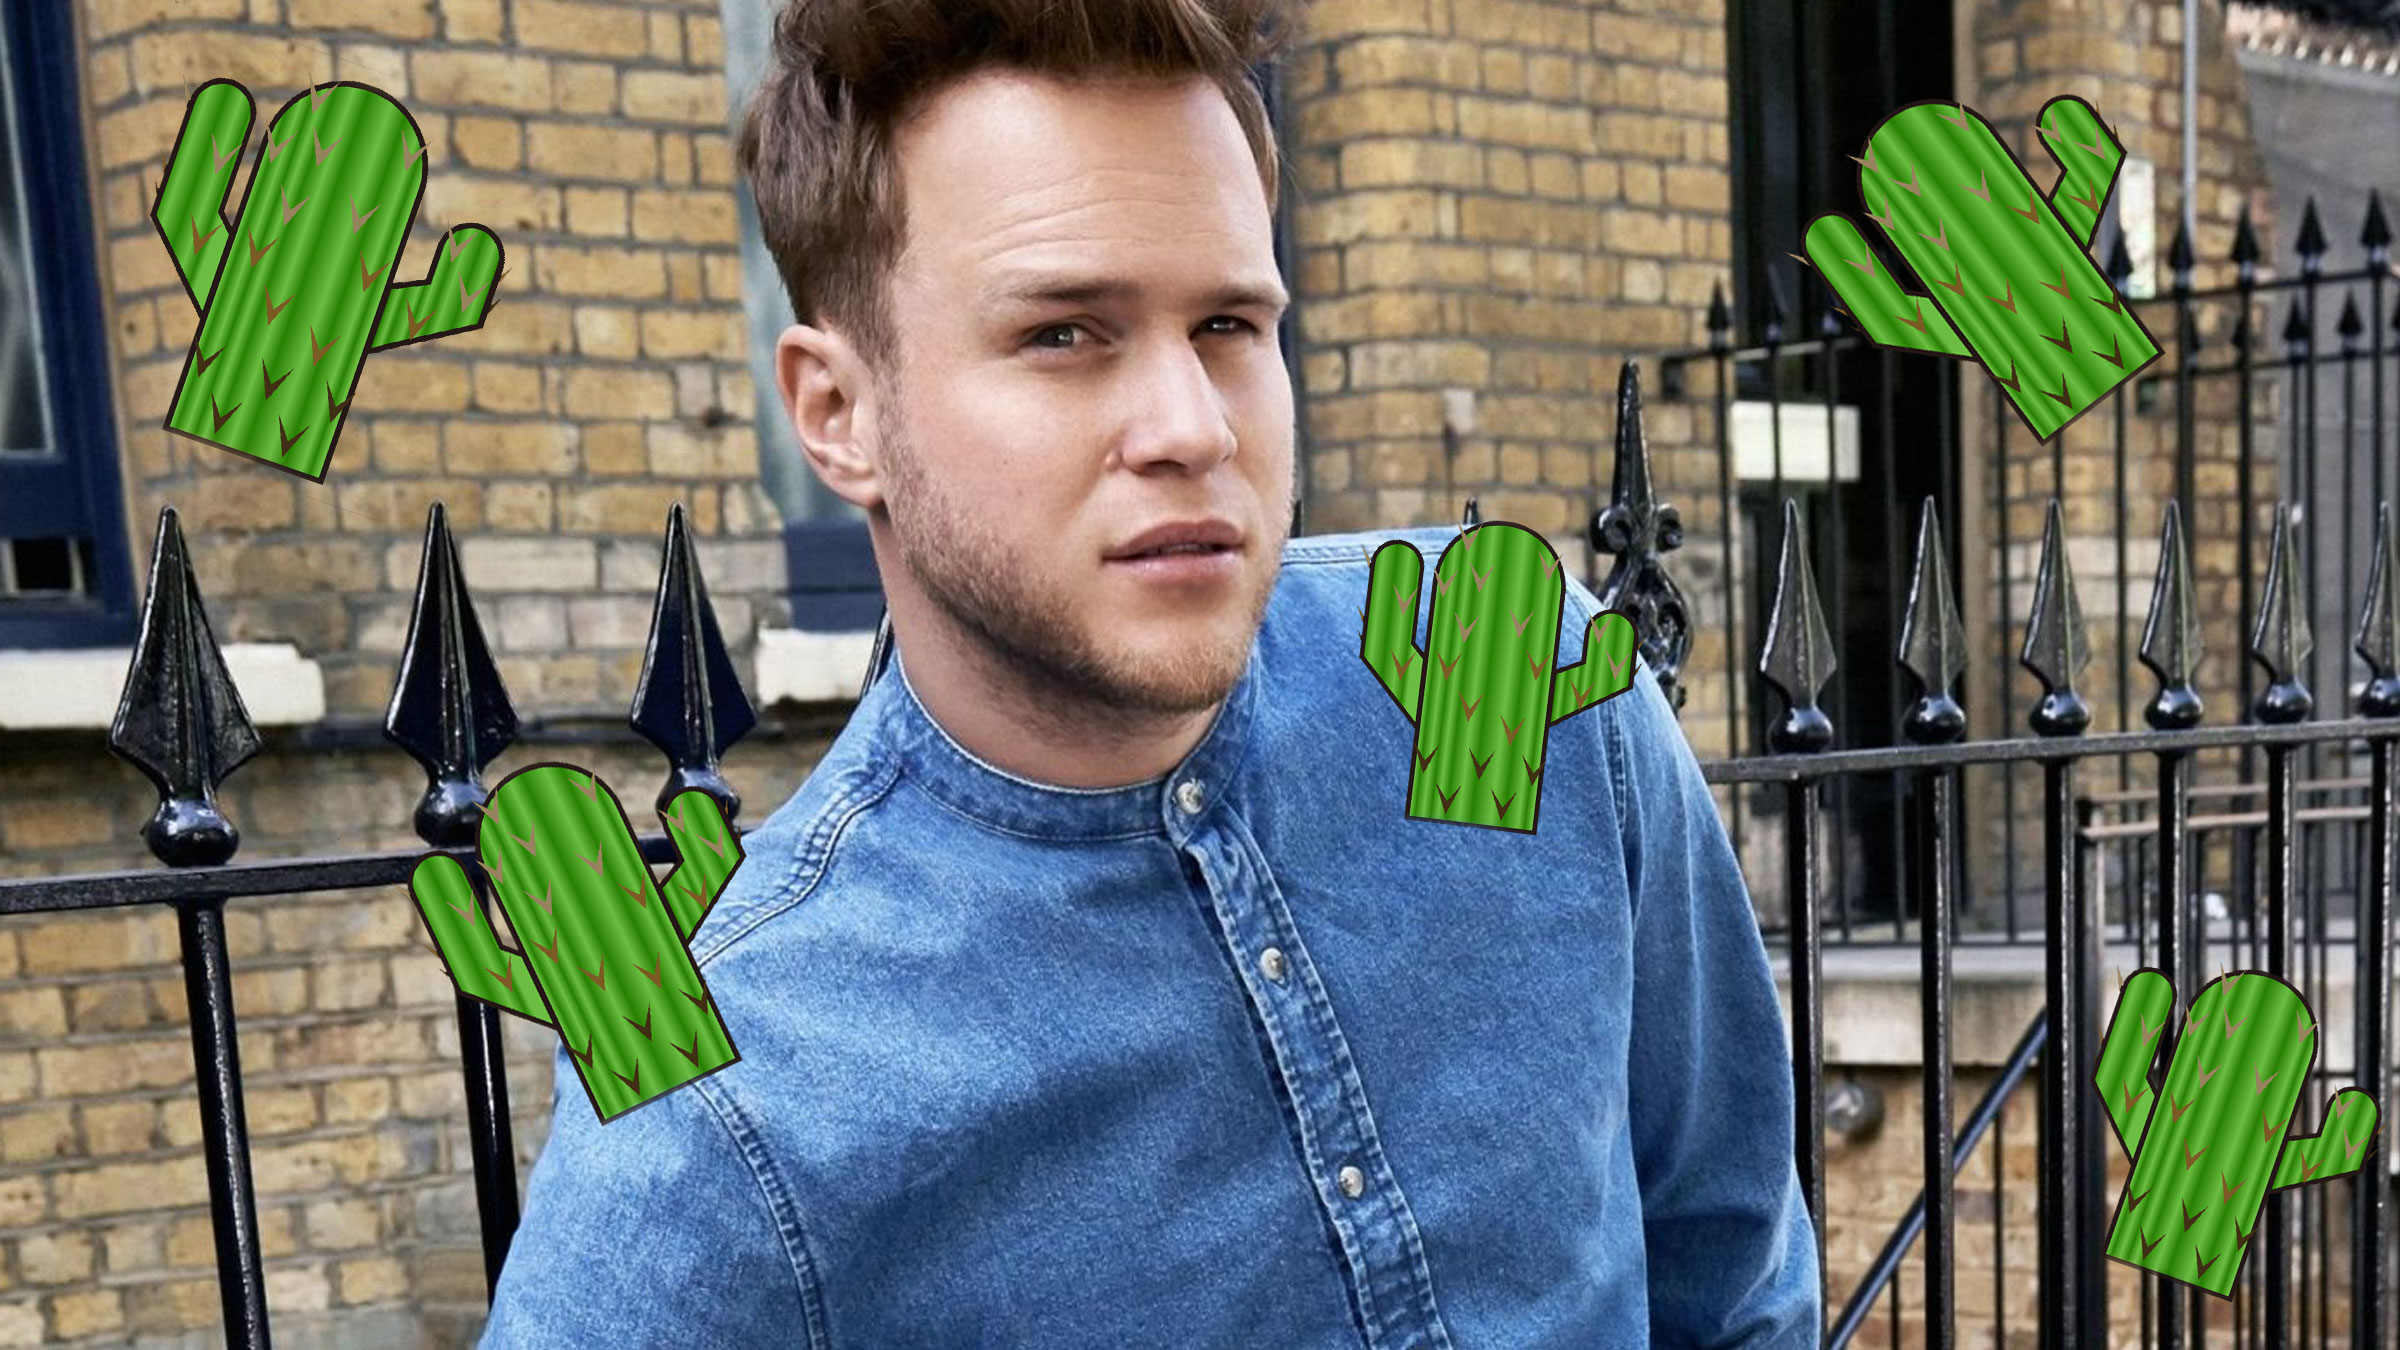 Olly cactus